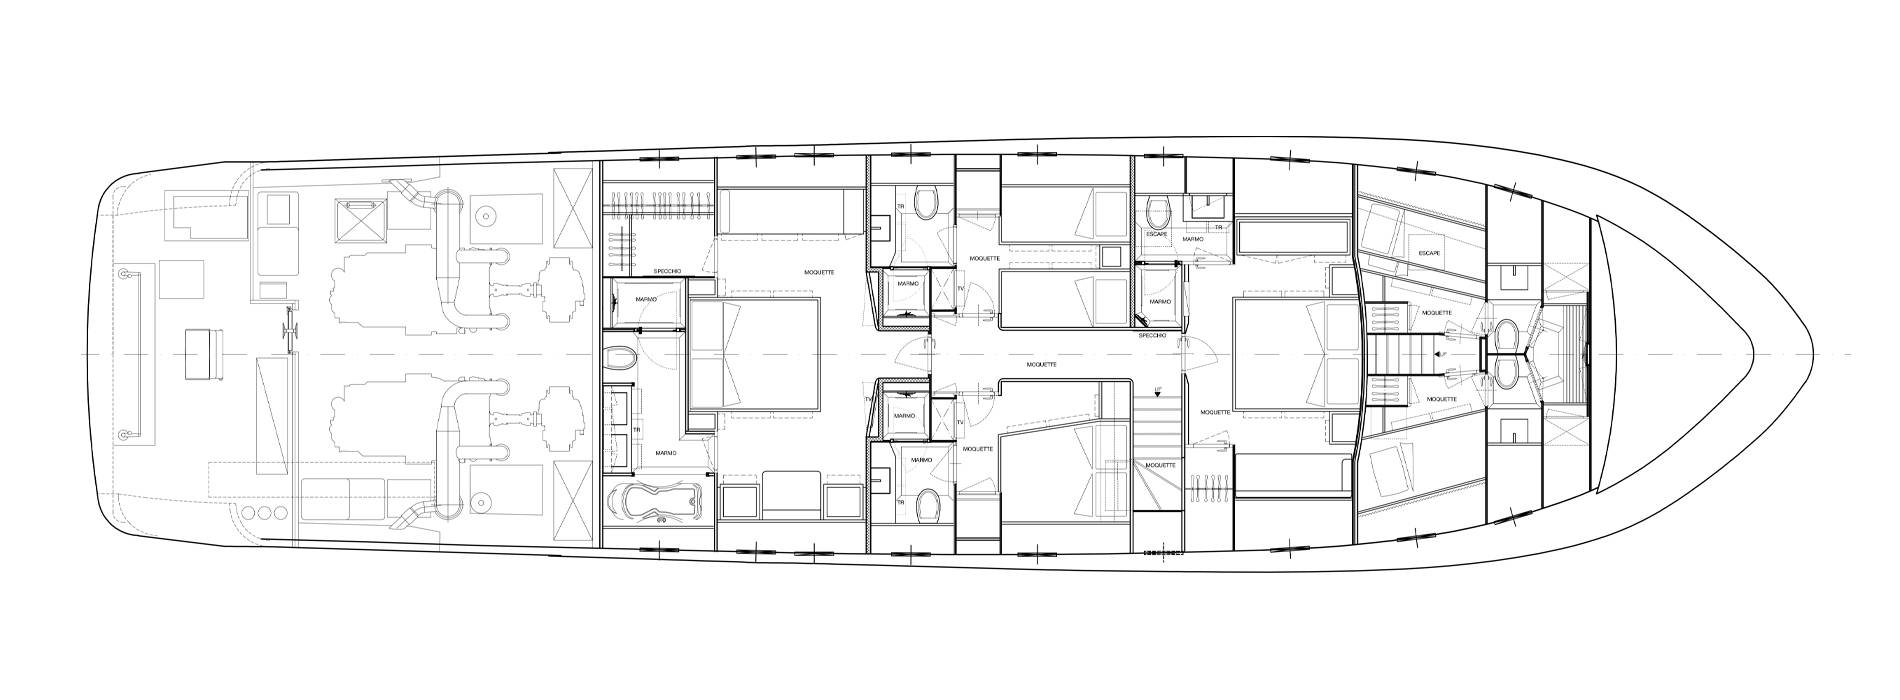 Sanlorenzo Yachts SL88-541 Lower Deck